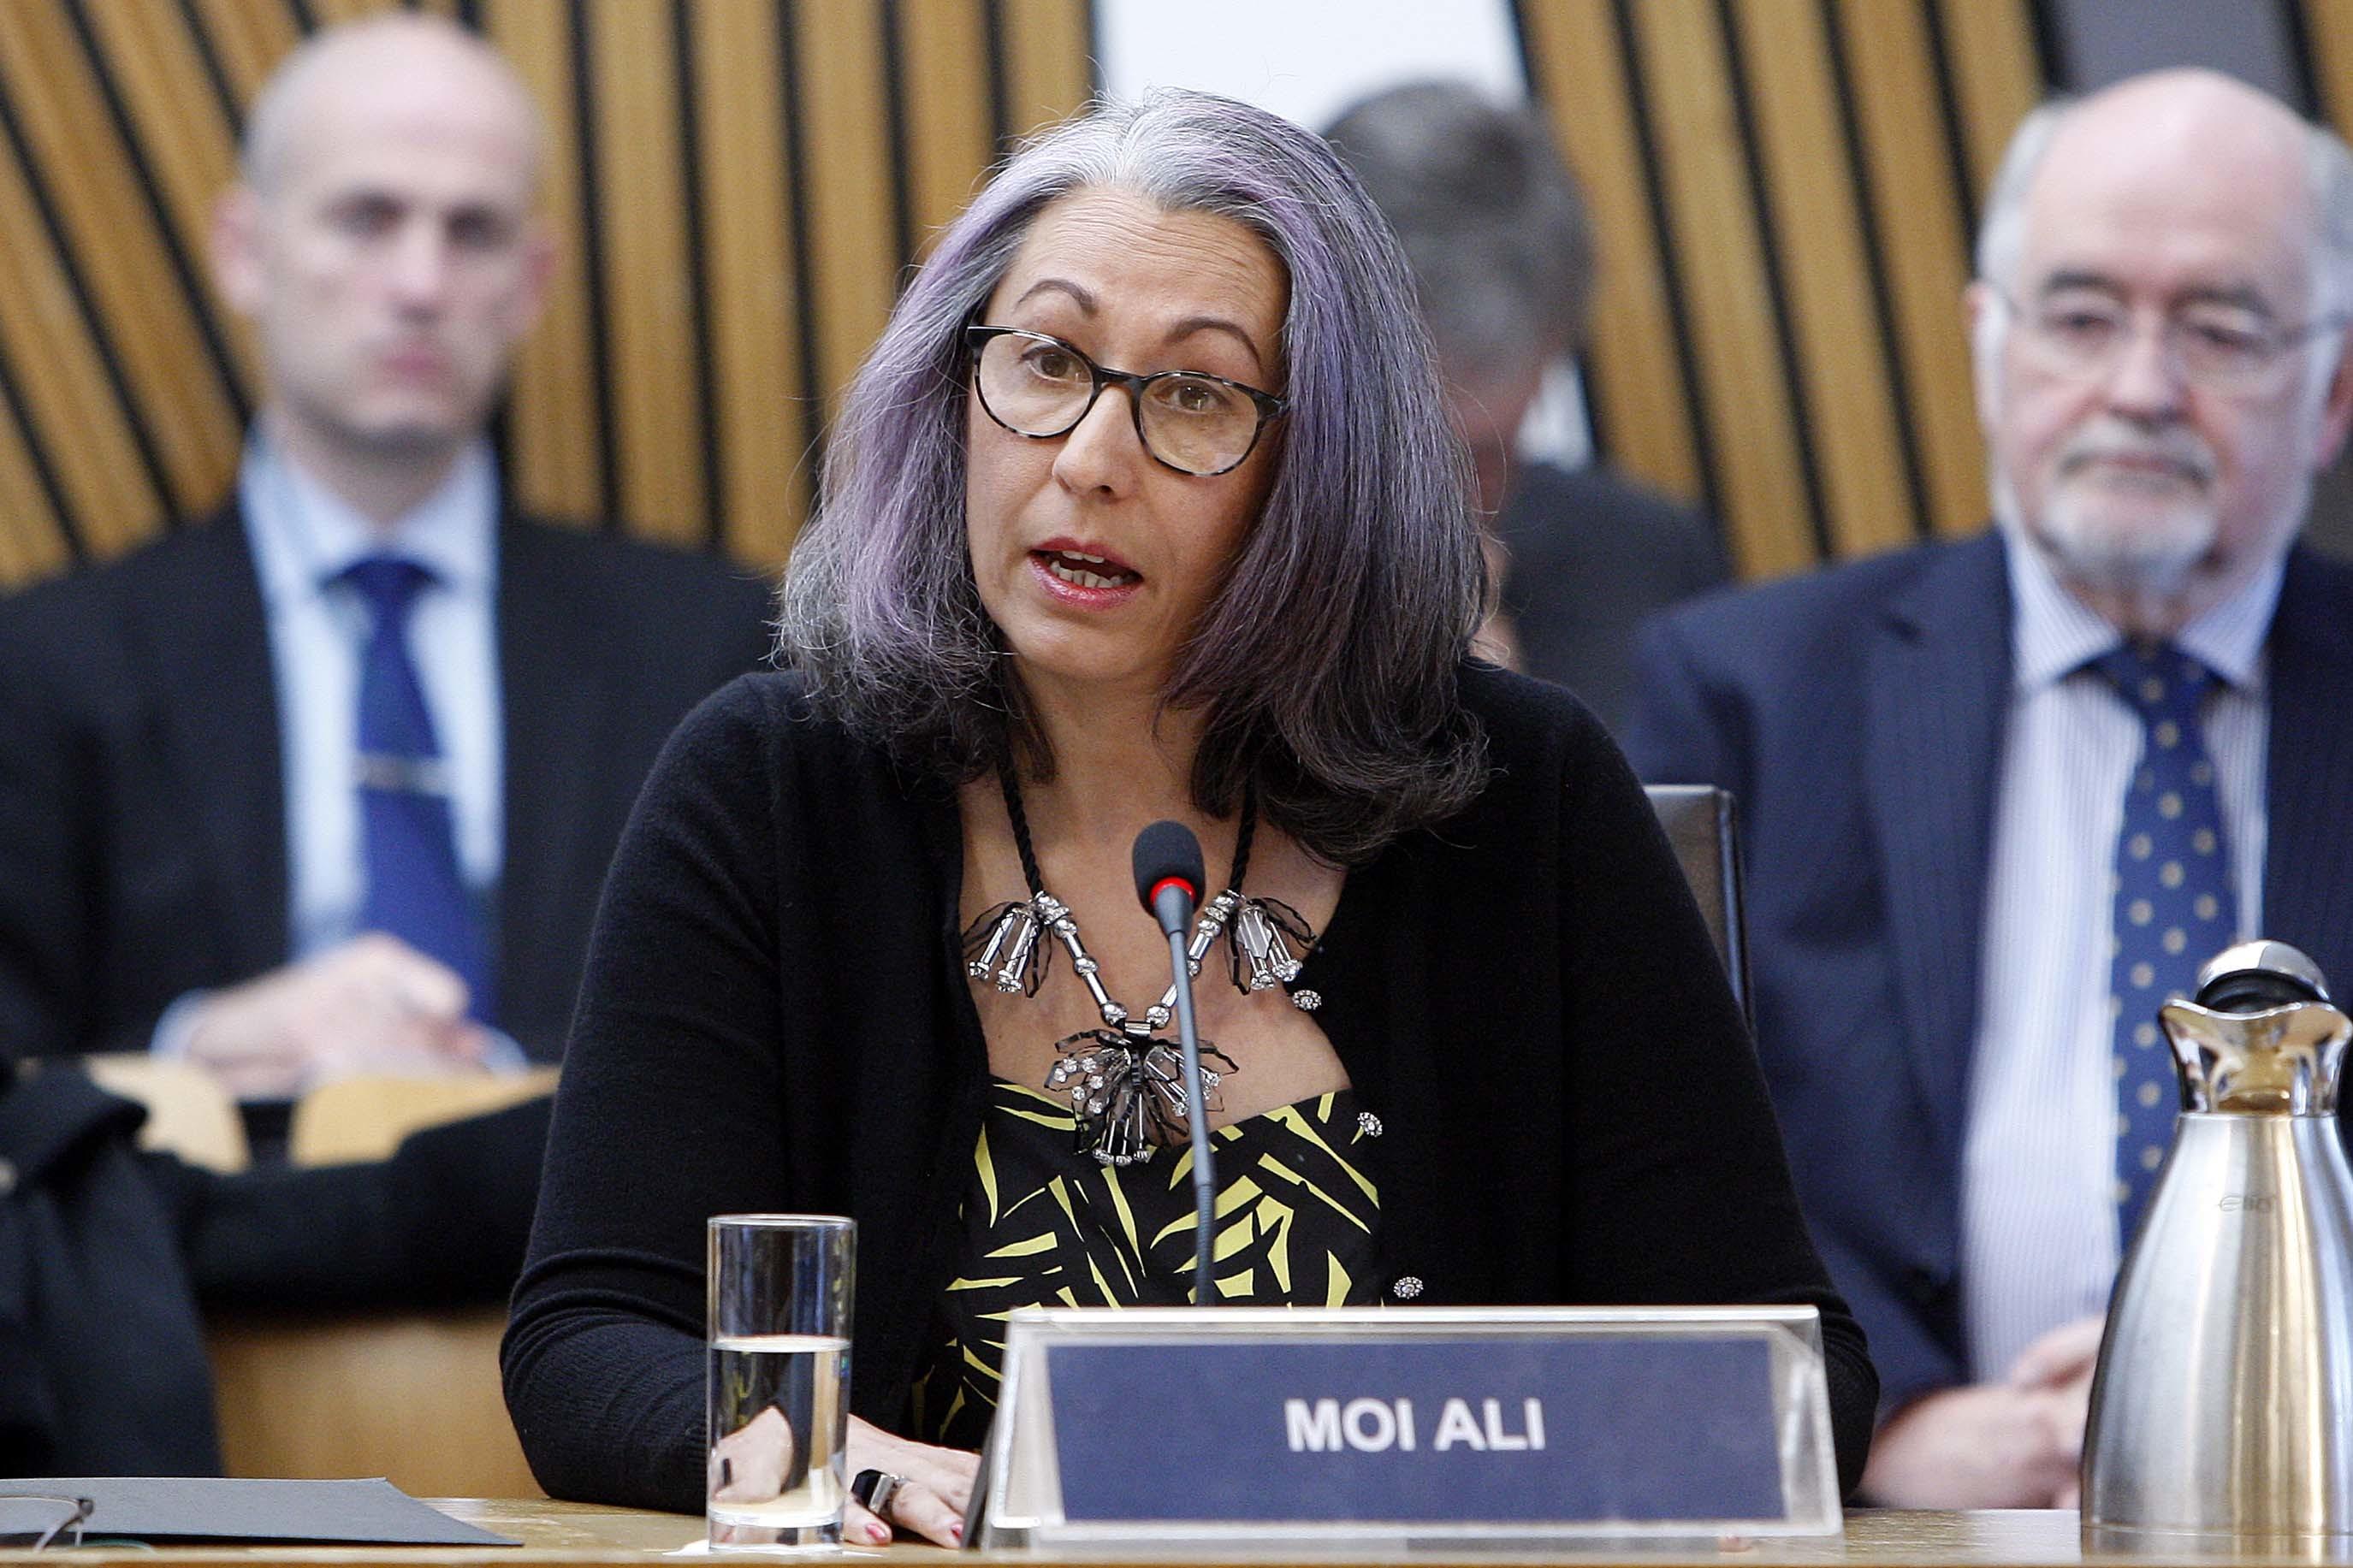 Moi Ali, former SPA board member (Andrew Cowan/Scottish Parliament)